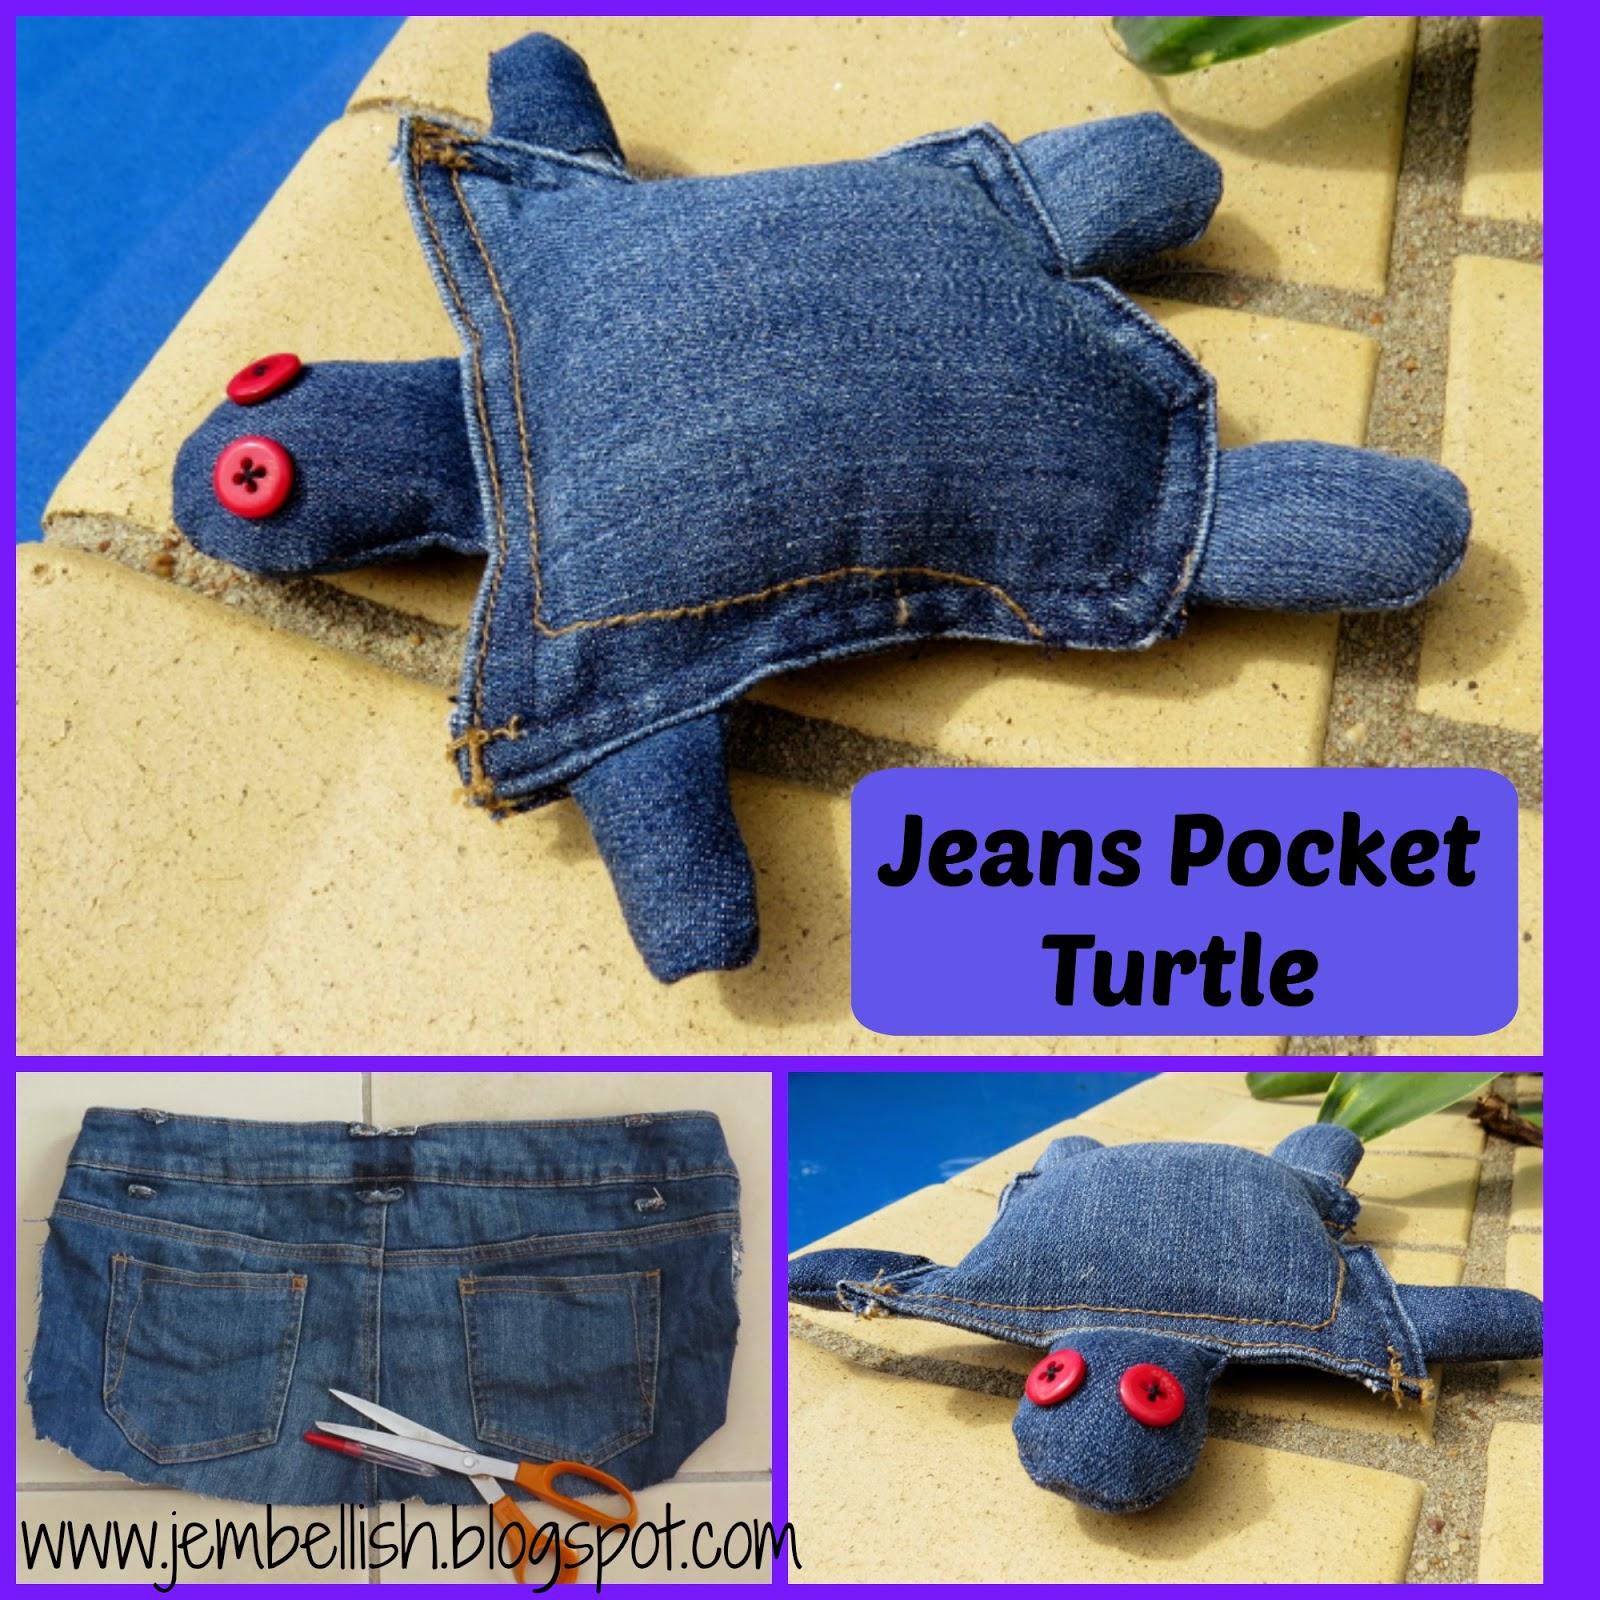 Jeans Pocket Turtle